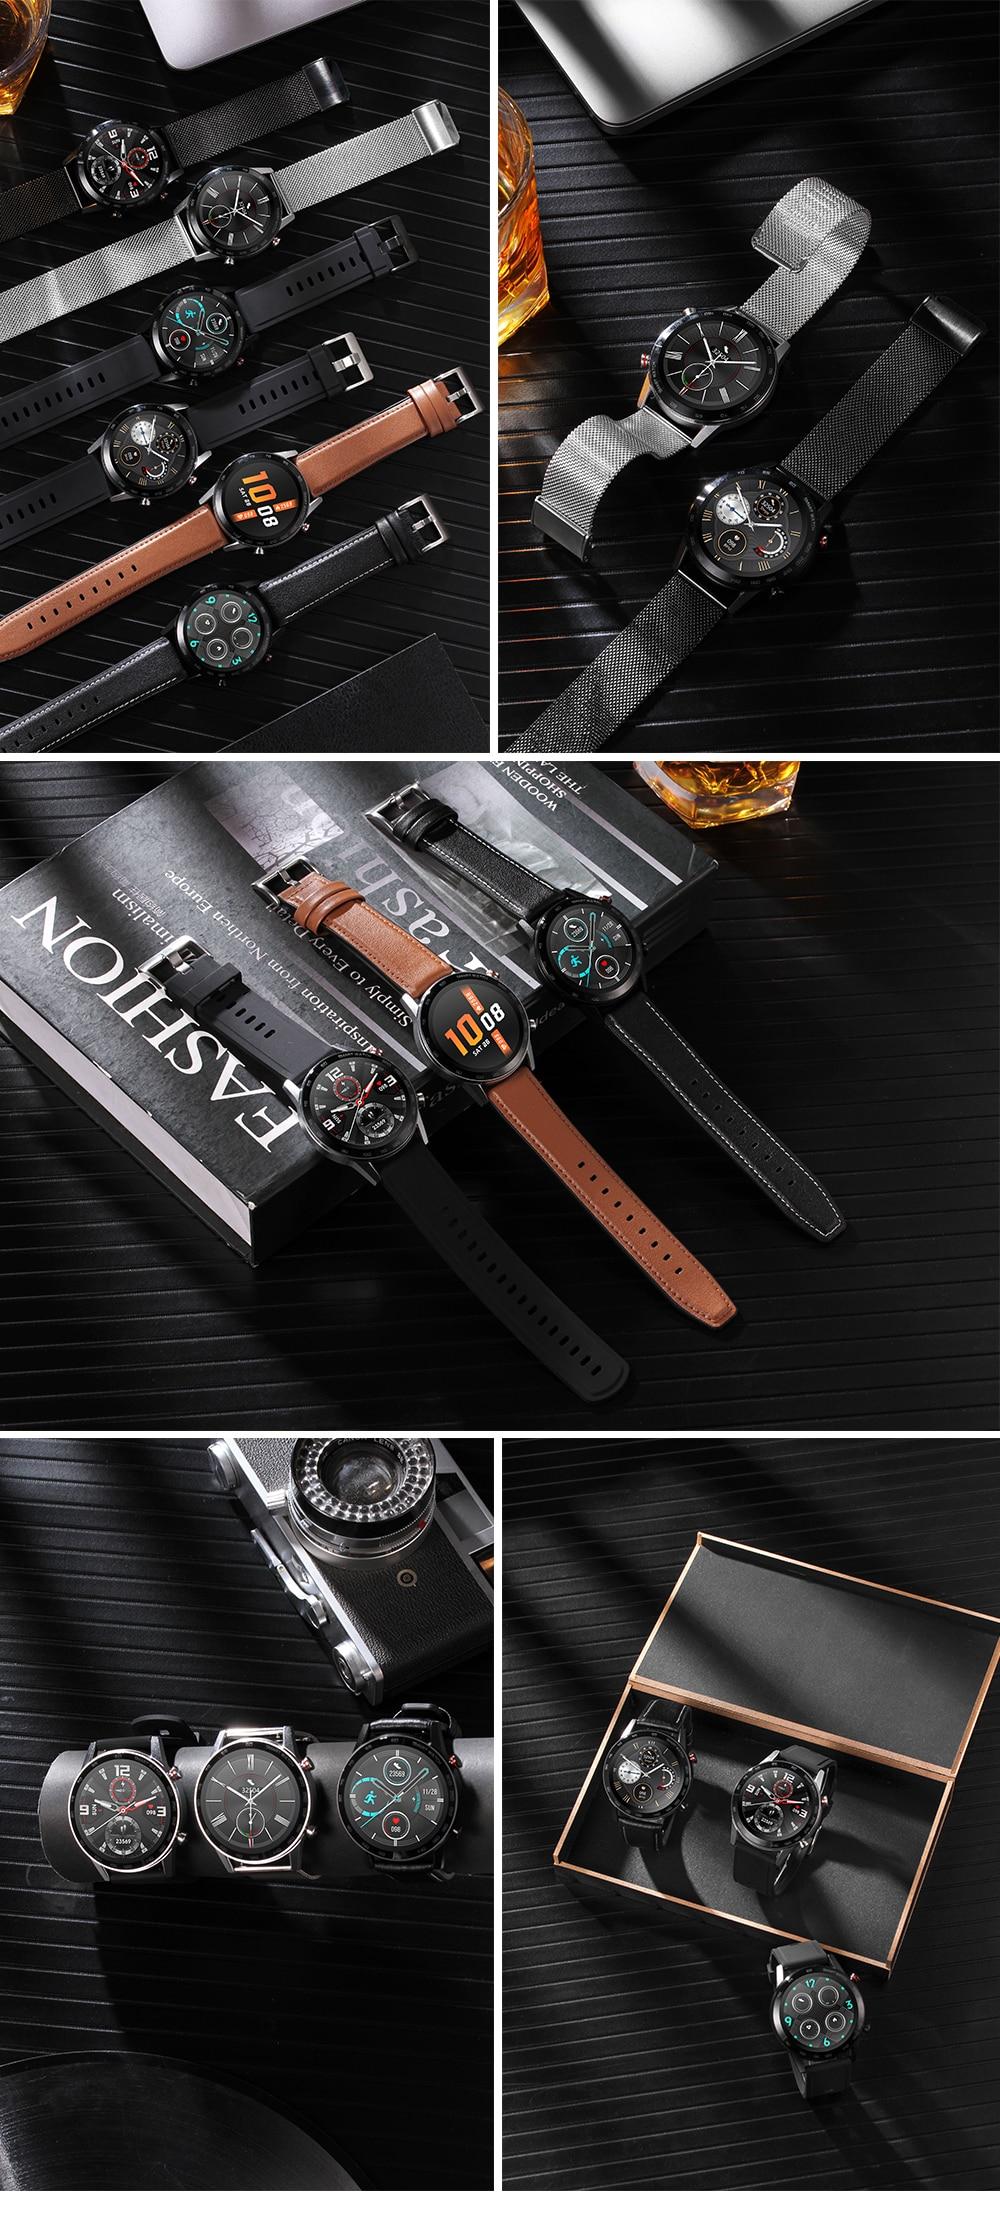 H334b135c5ea64362823631d9176e58fbG 2021 SANLEPUS ECG Smart Watch Dial Call Smartwatch Men Sport Fitness Bracelet Clock Watches For Android Apple Xiaomi